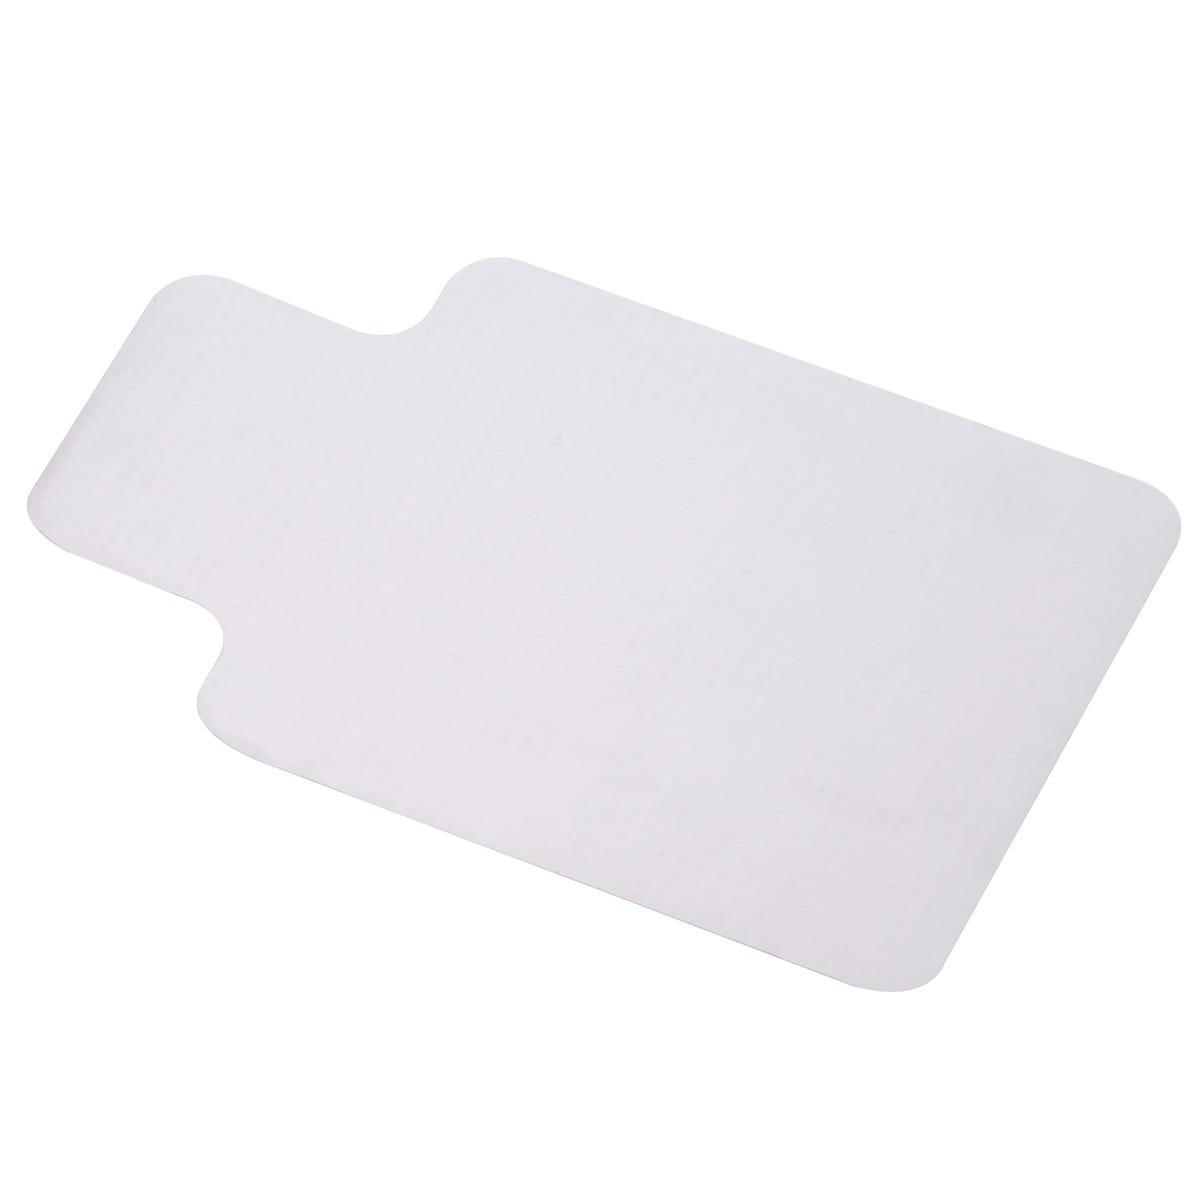 Clear PVC Office Chair Non-slip Mat for Carpet